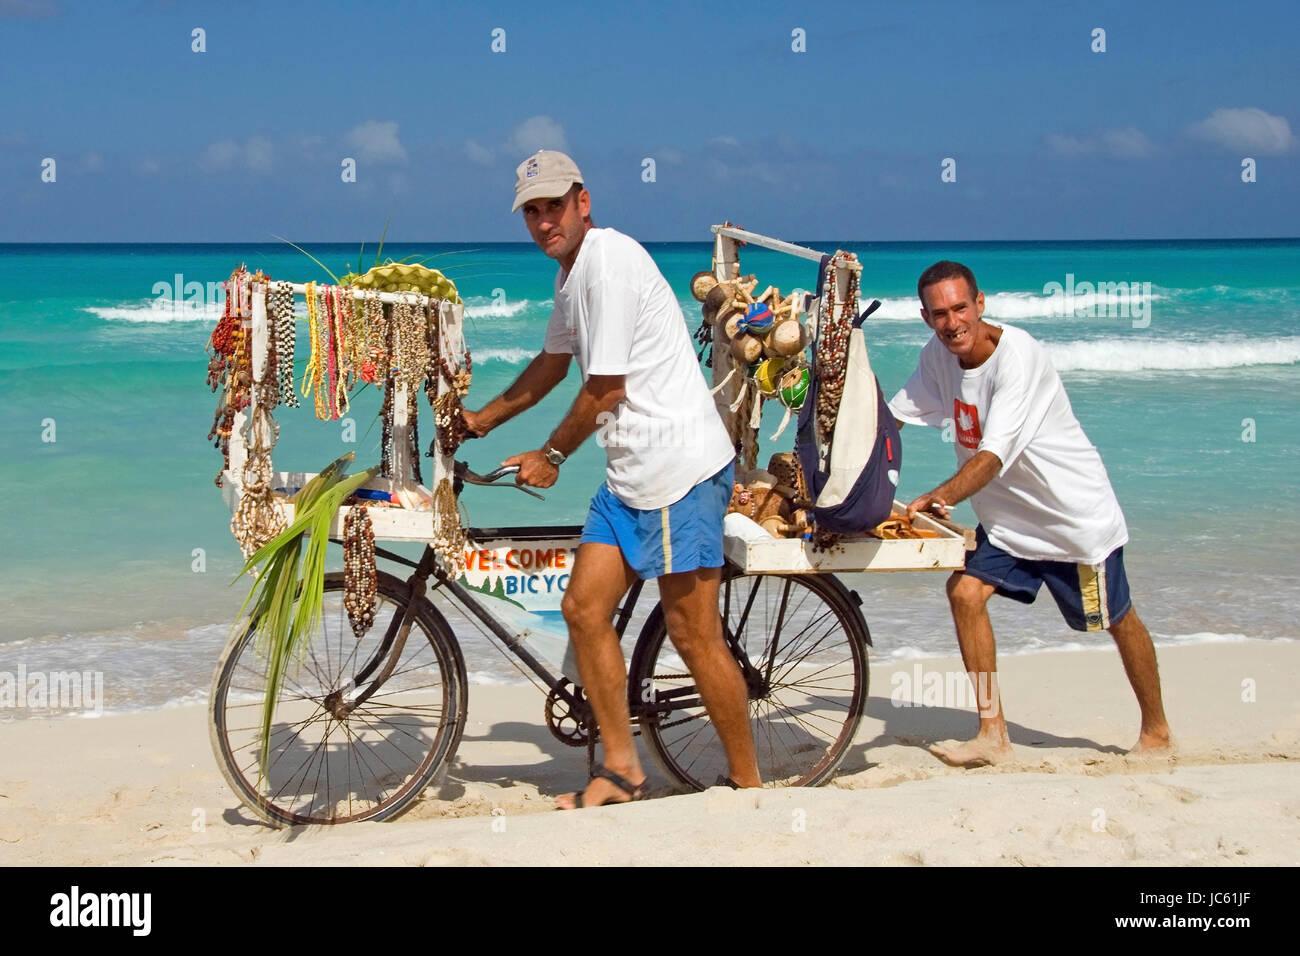 Cuba, the Caribbean, Varadero, beach shop assistant by bicycle, Kuba, Karibik,  Strandverkaeufer mit Fahrrad Stock Photo